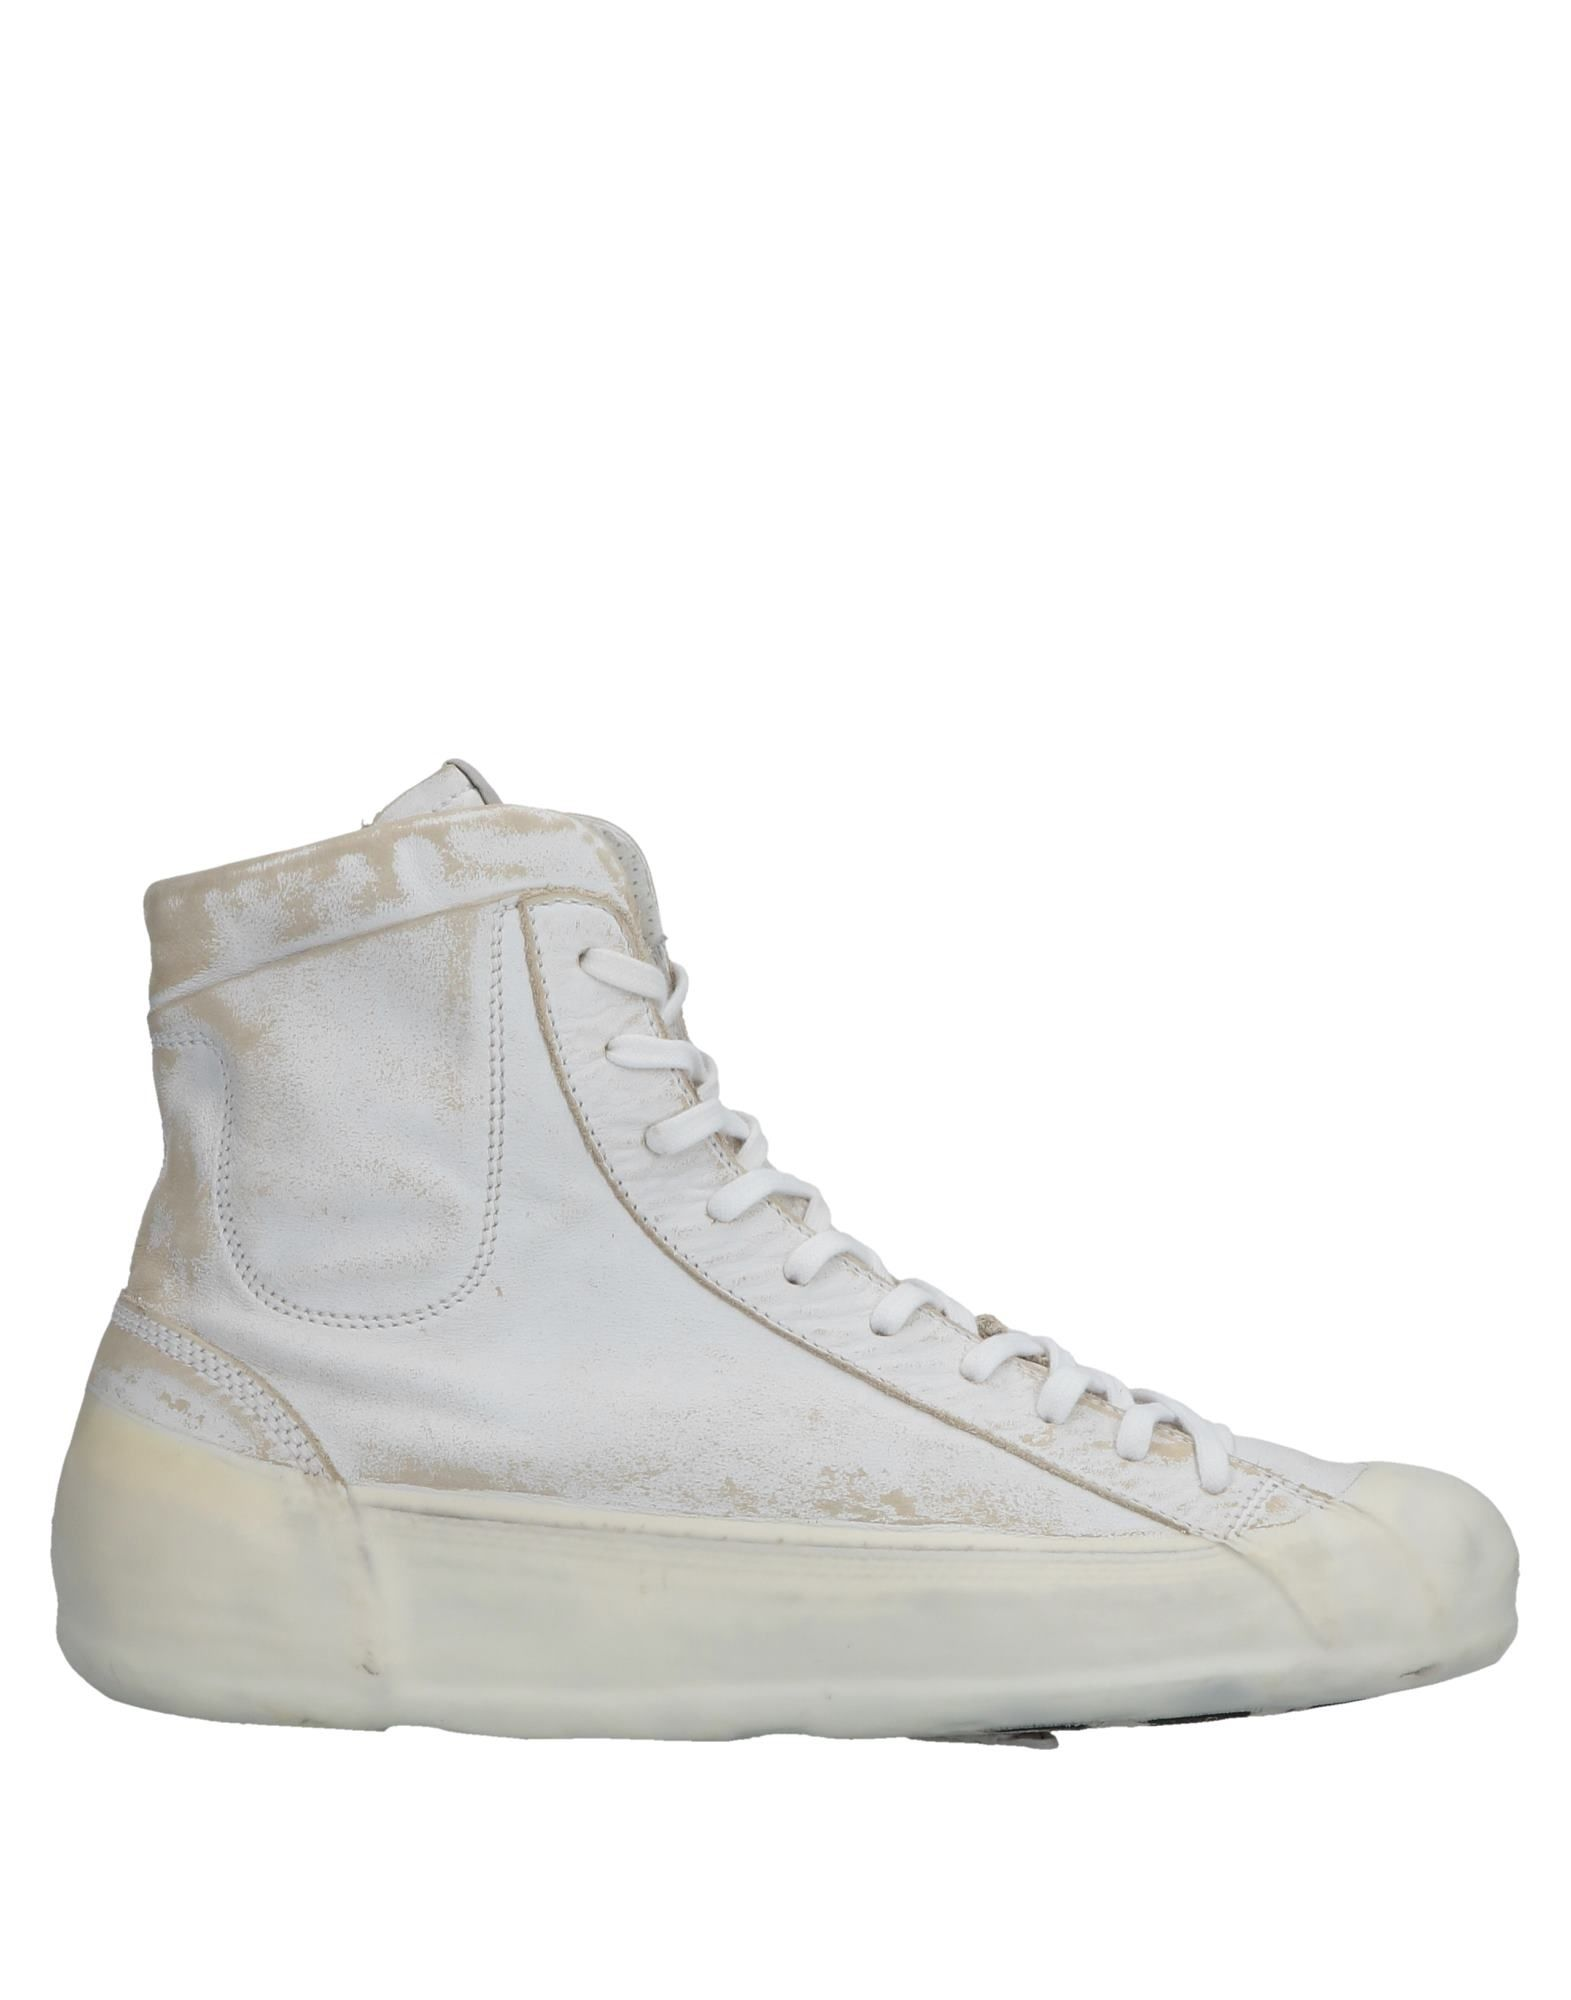 O.X.S. Rubber Soul Sneakers Damen Gutes Preis-Leistungs-Verhältnis, lohnt es lohnt Preis-Leistungs-Verhältnis, sich 92b9f7